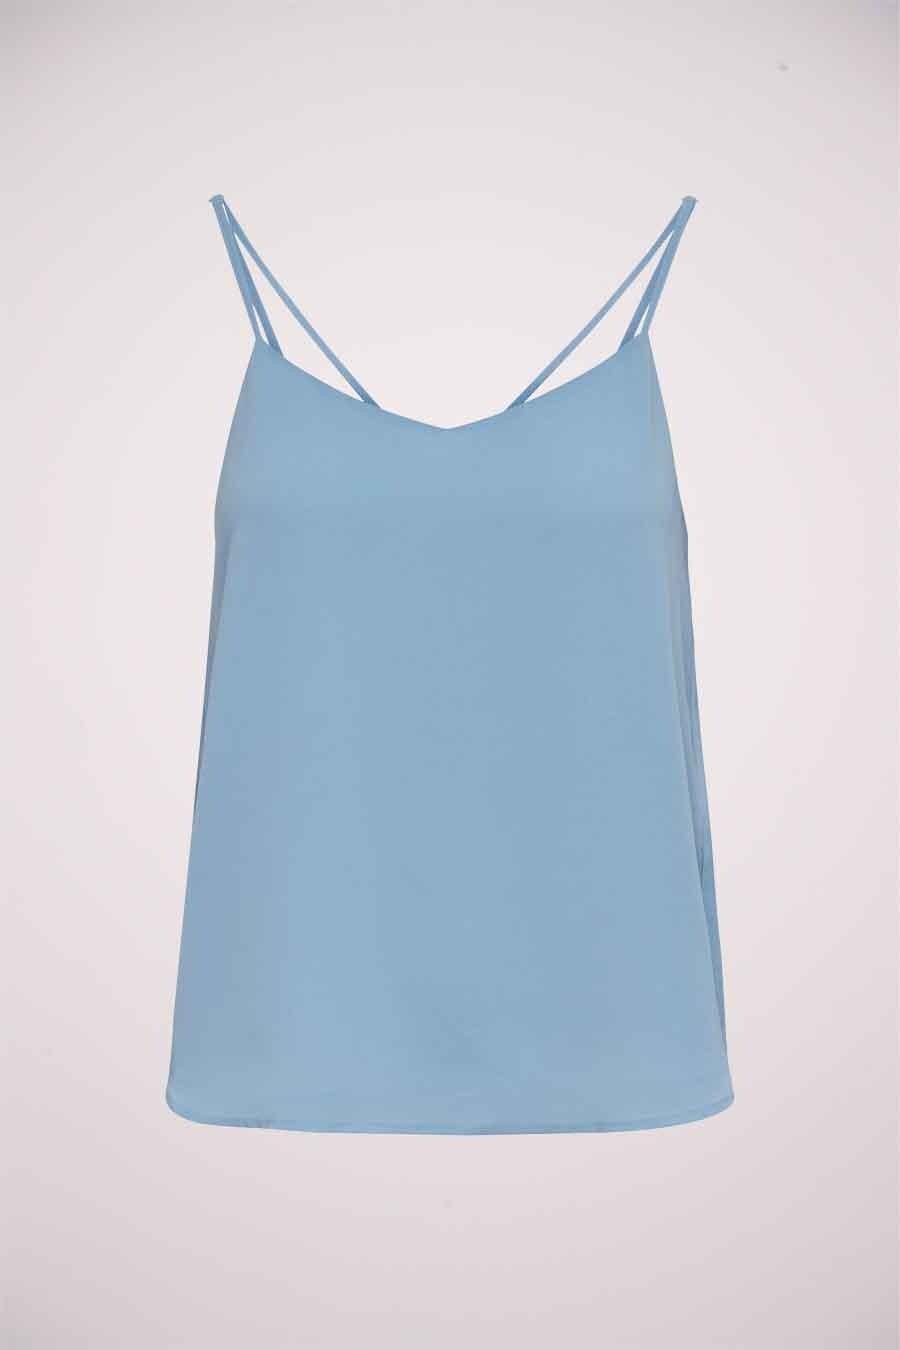 ONLY® Blouse zonder mouwen, Blauw, Dames, Maat: 34/42